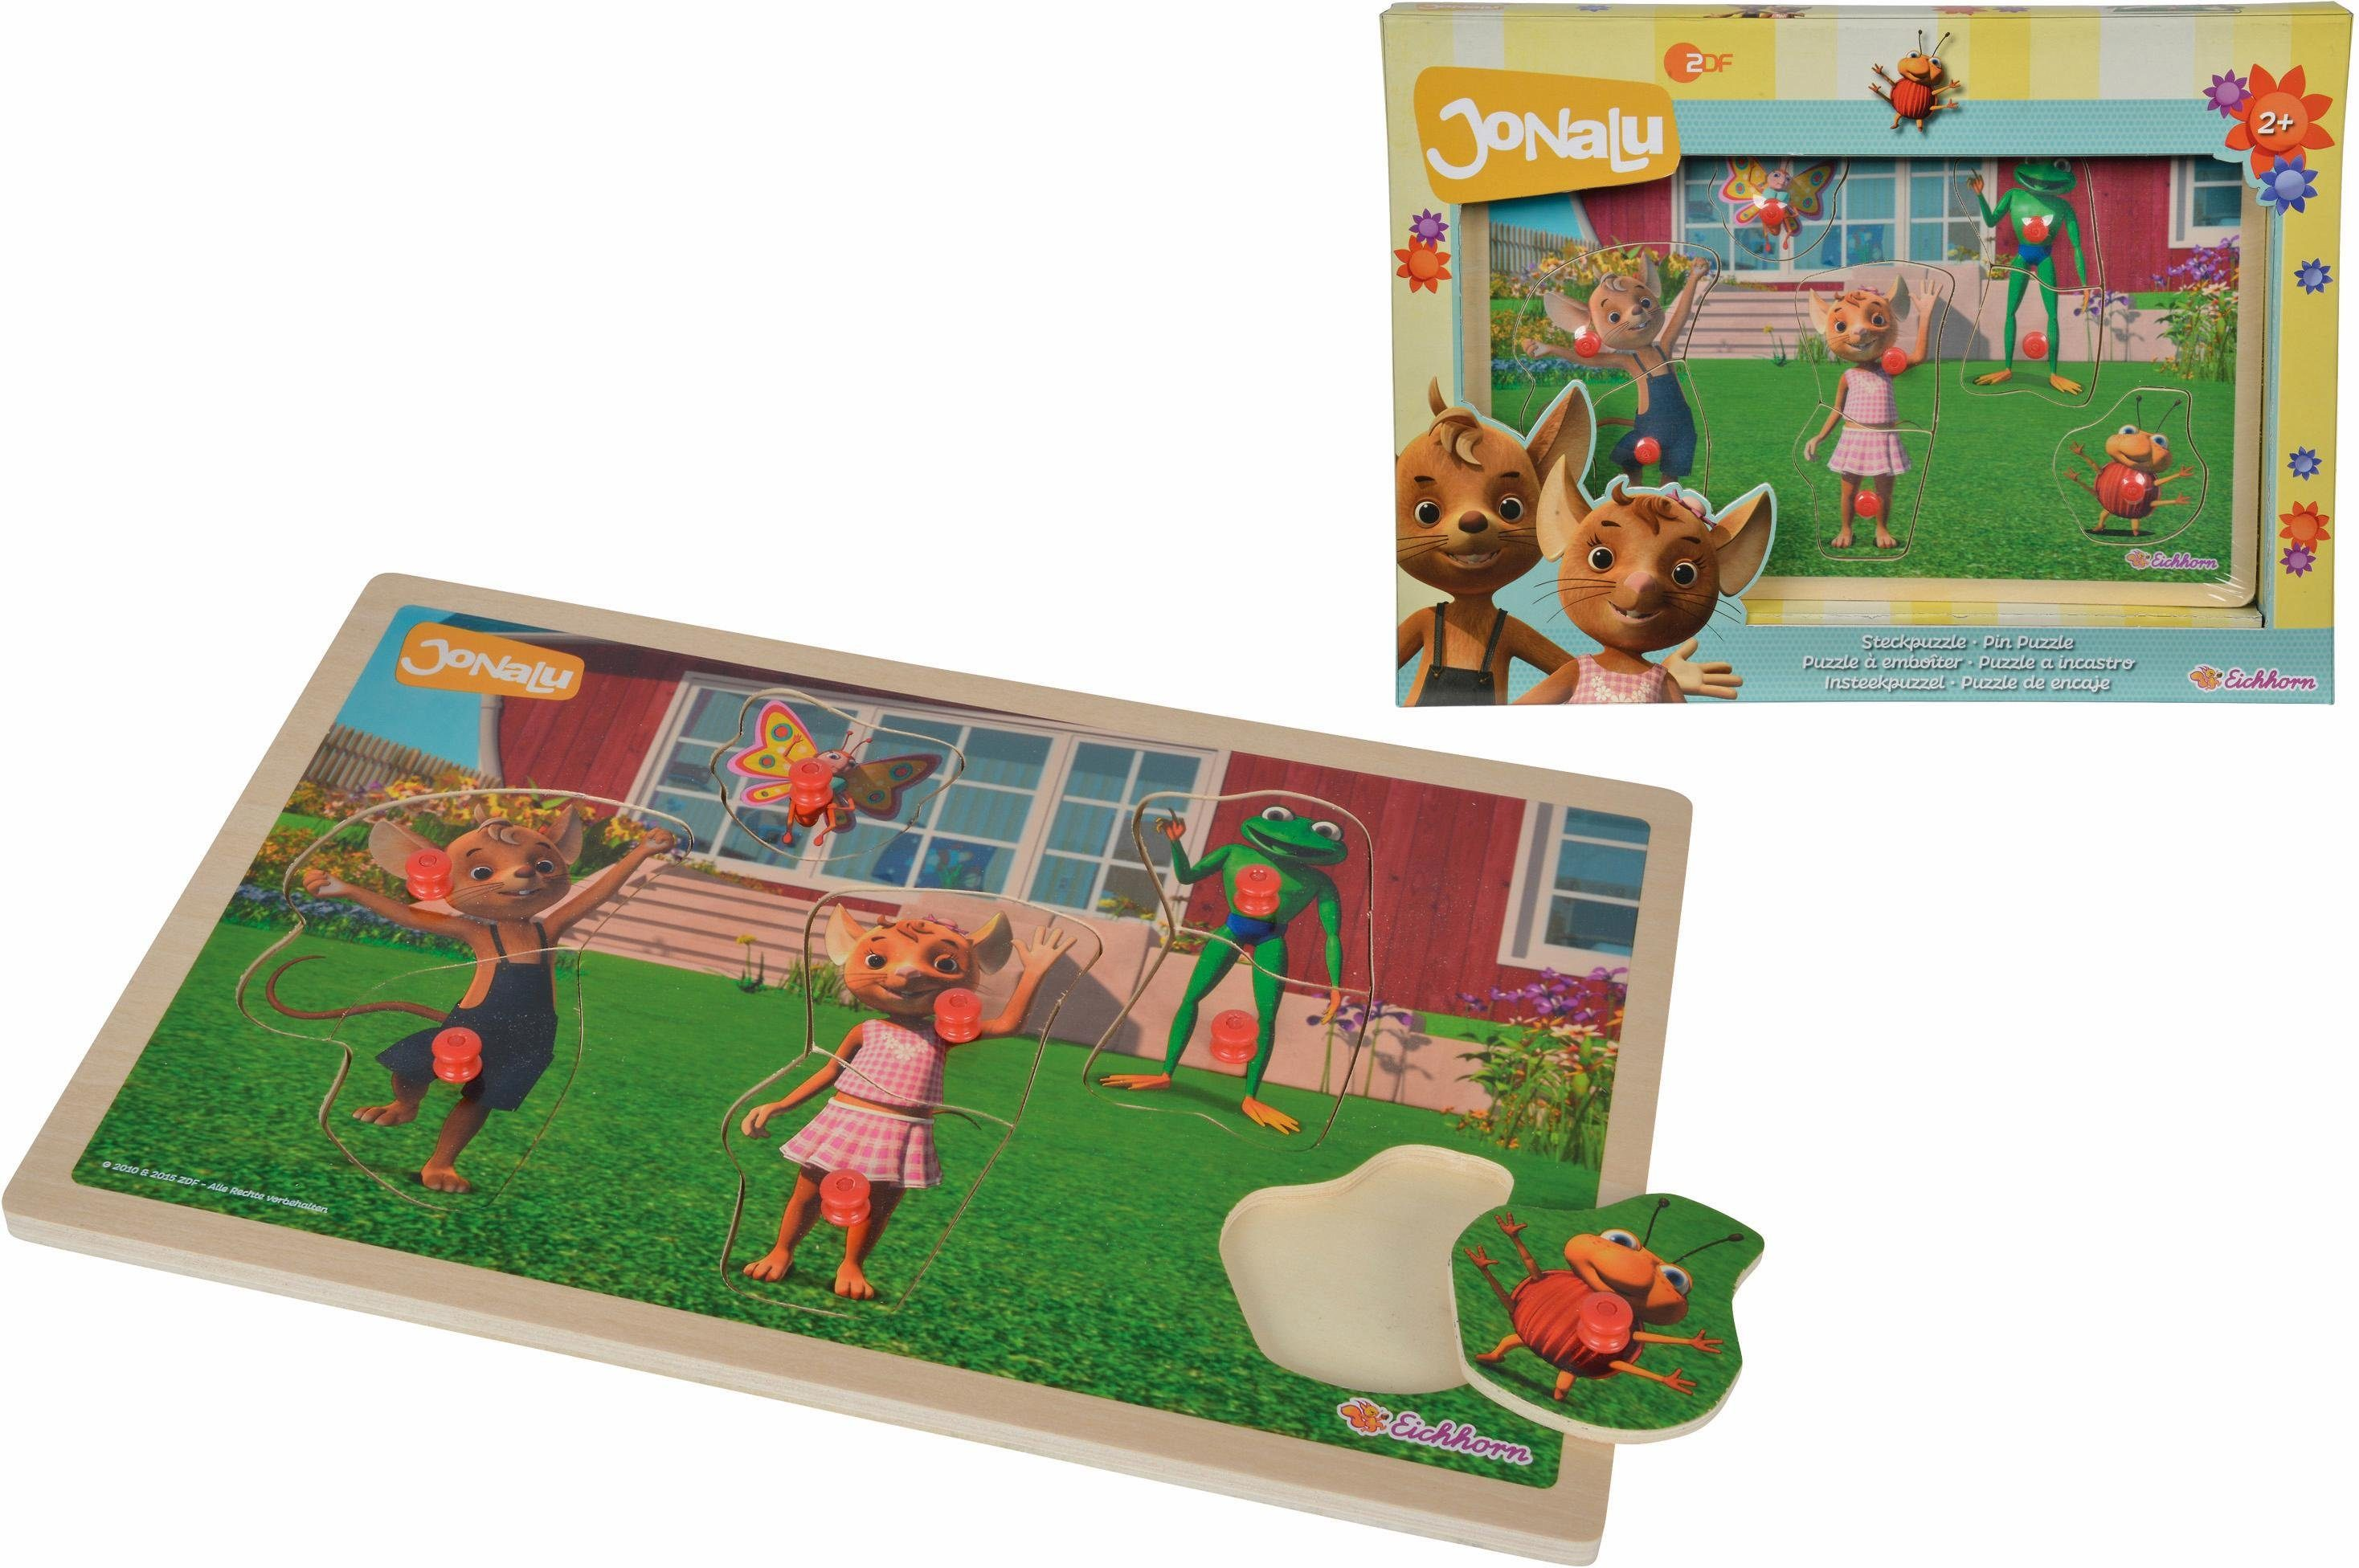 Eichhorn Holzspielzeug, »JoNaLu Steckpuzzle«